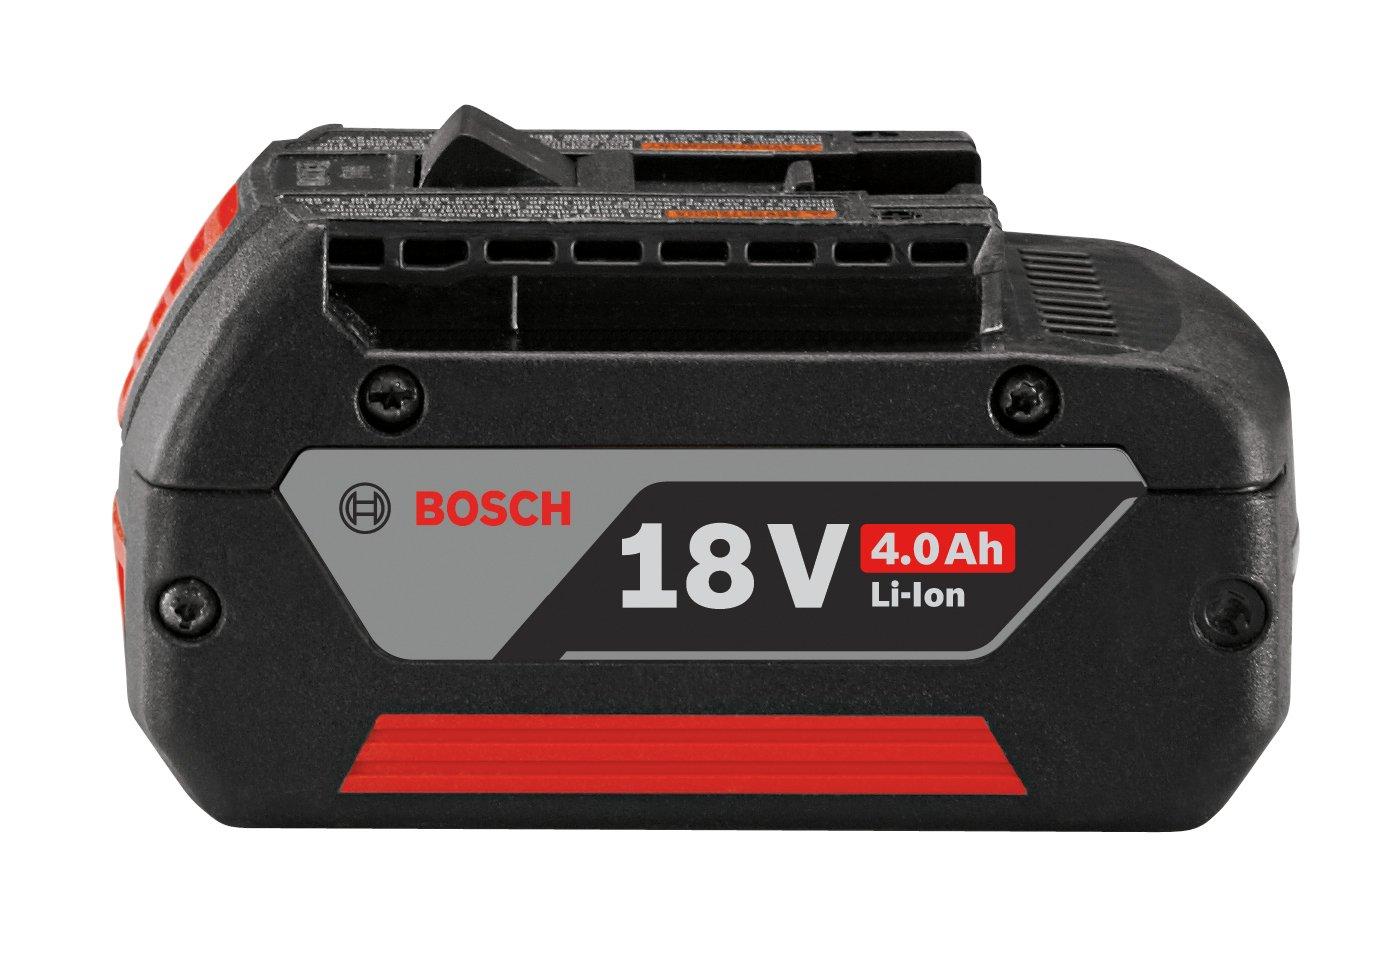 [Amazon Canada]Bosch BAT620 18-Volt Li-Ion 4.0Ah Battery -CDN$ 64.00 + FREE Shipping